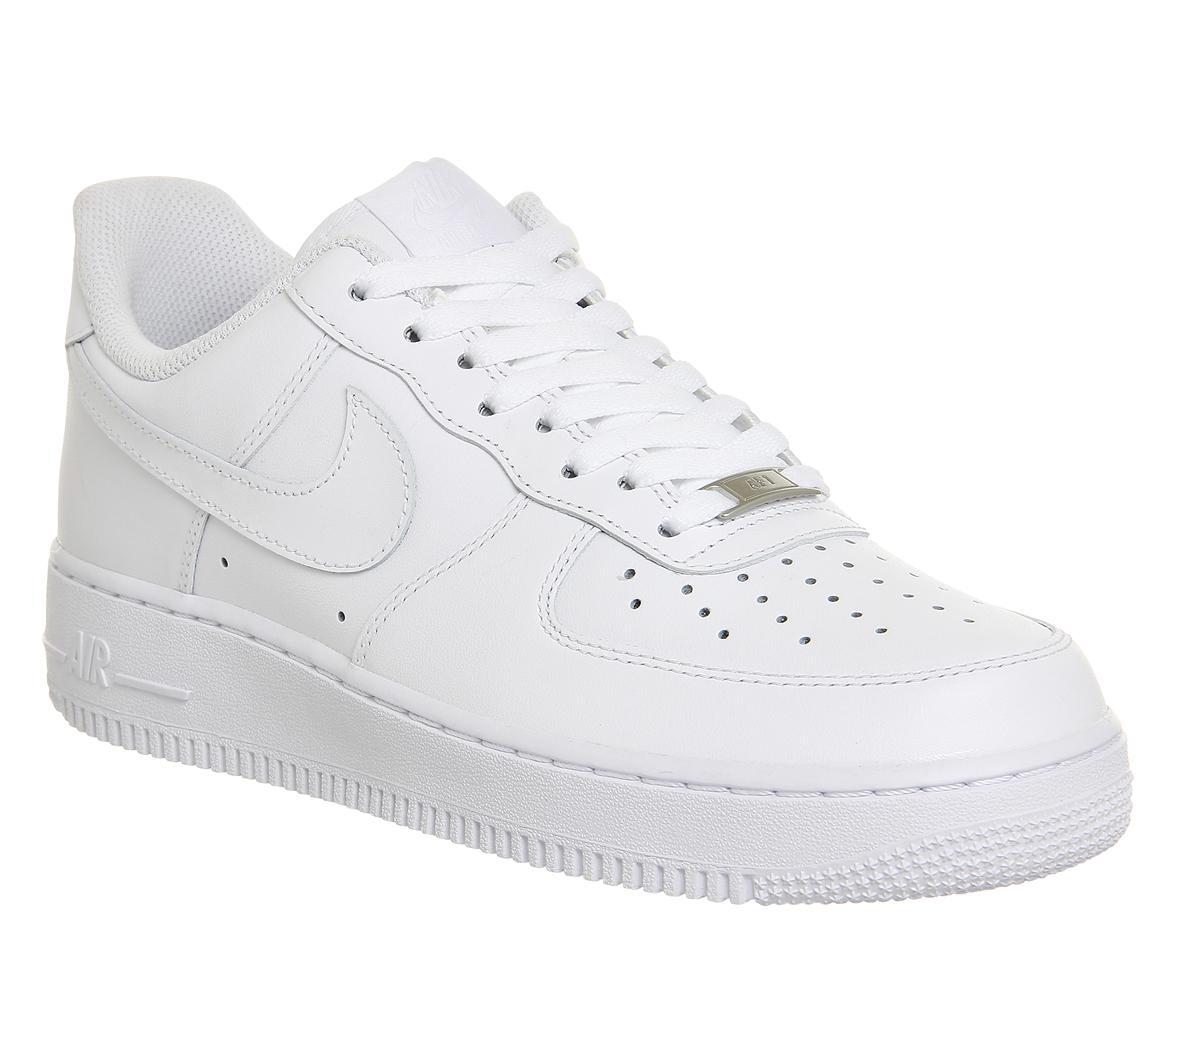 valor por dinero incomparable 100% autenticado Nike Air Force 1 Trainers White - His trainers